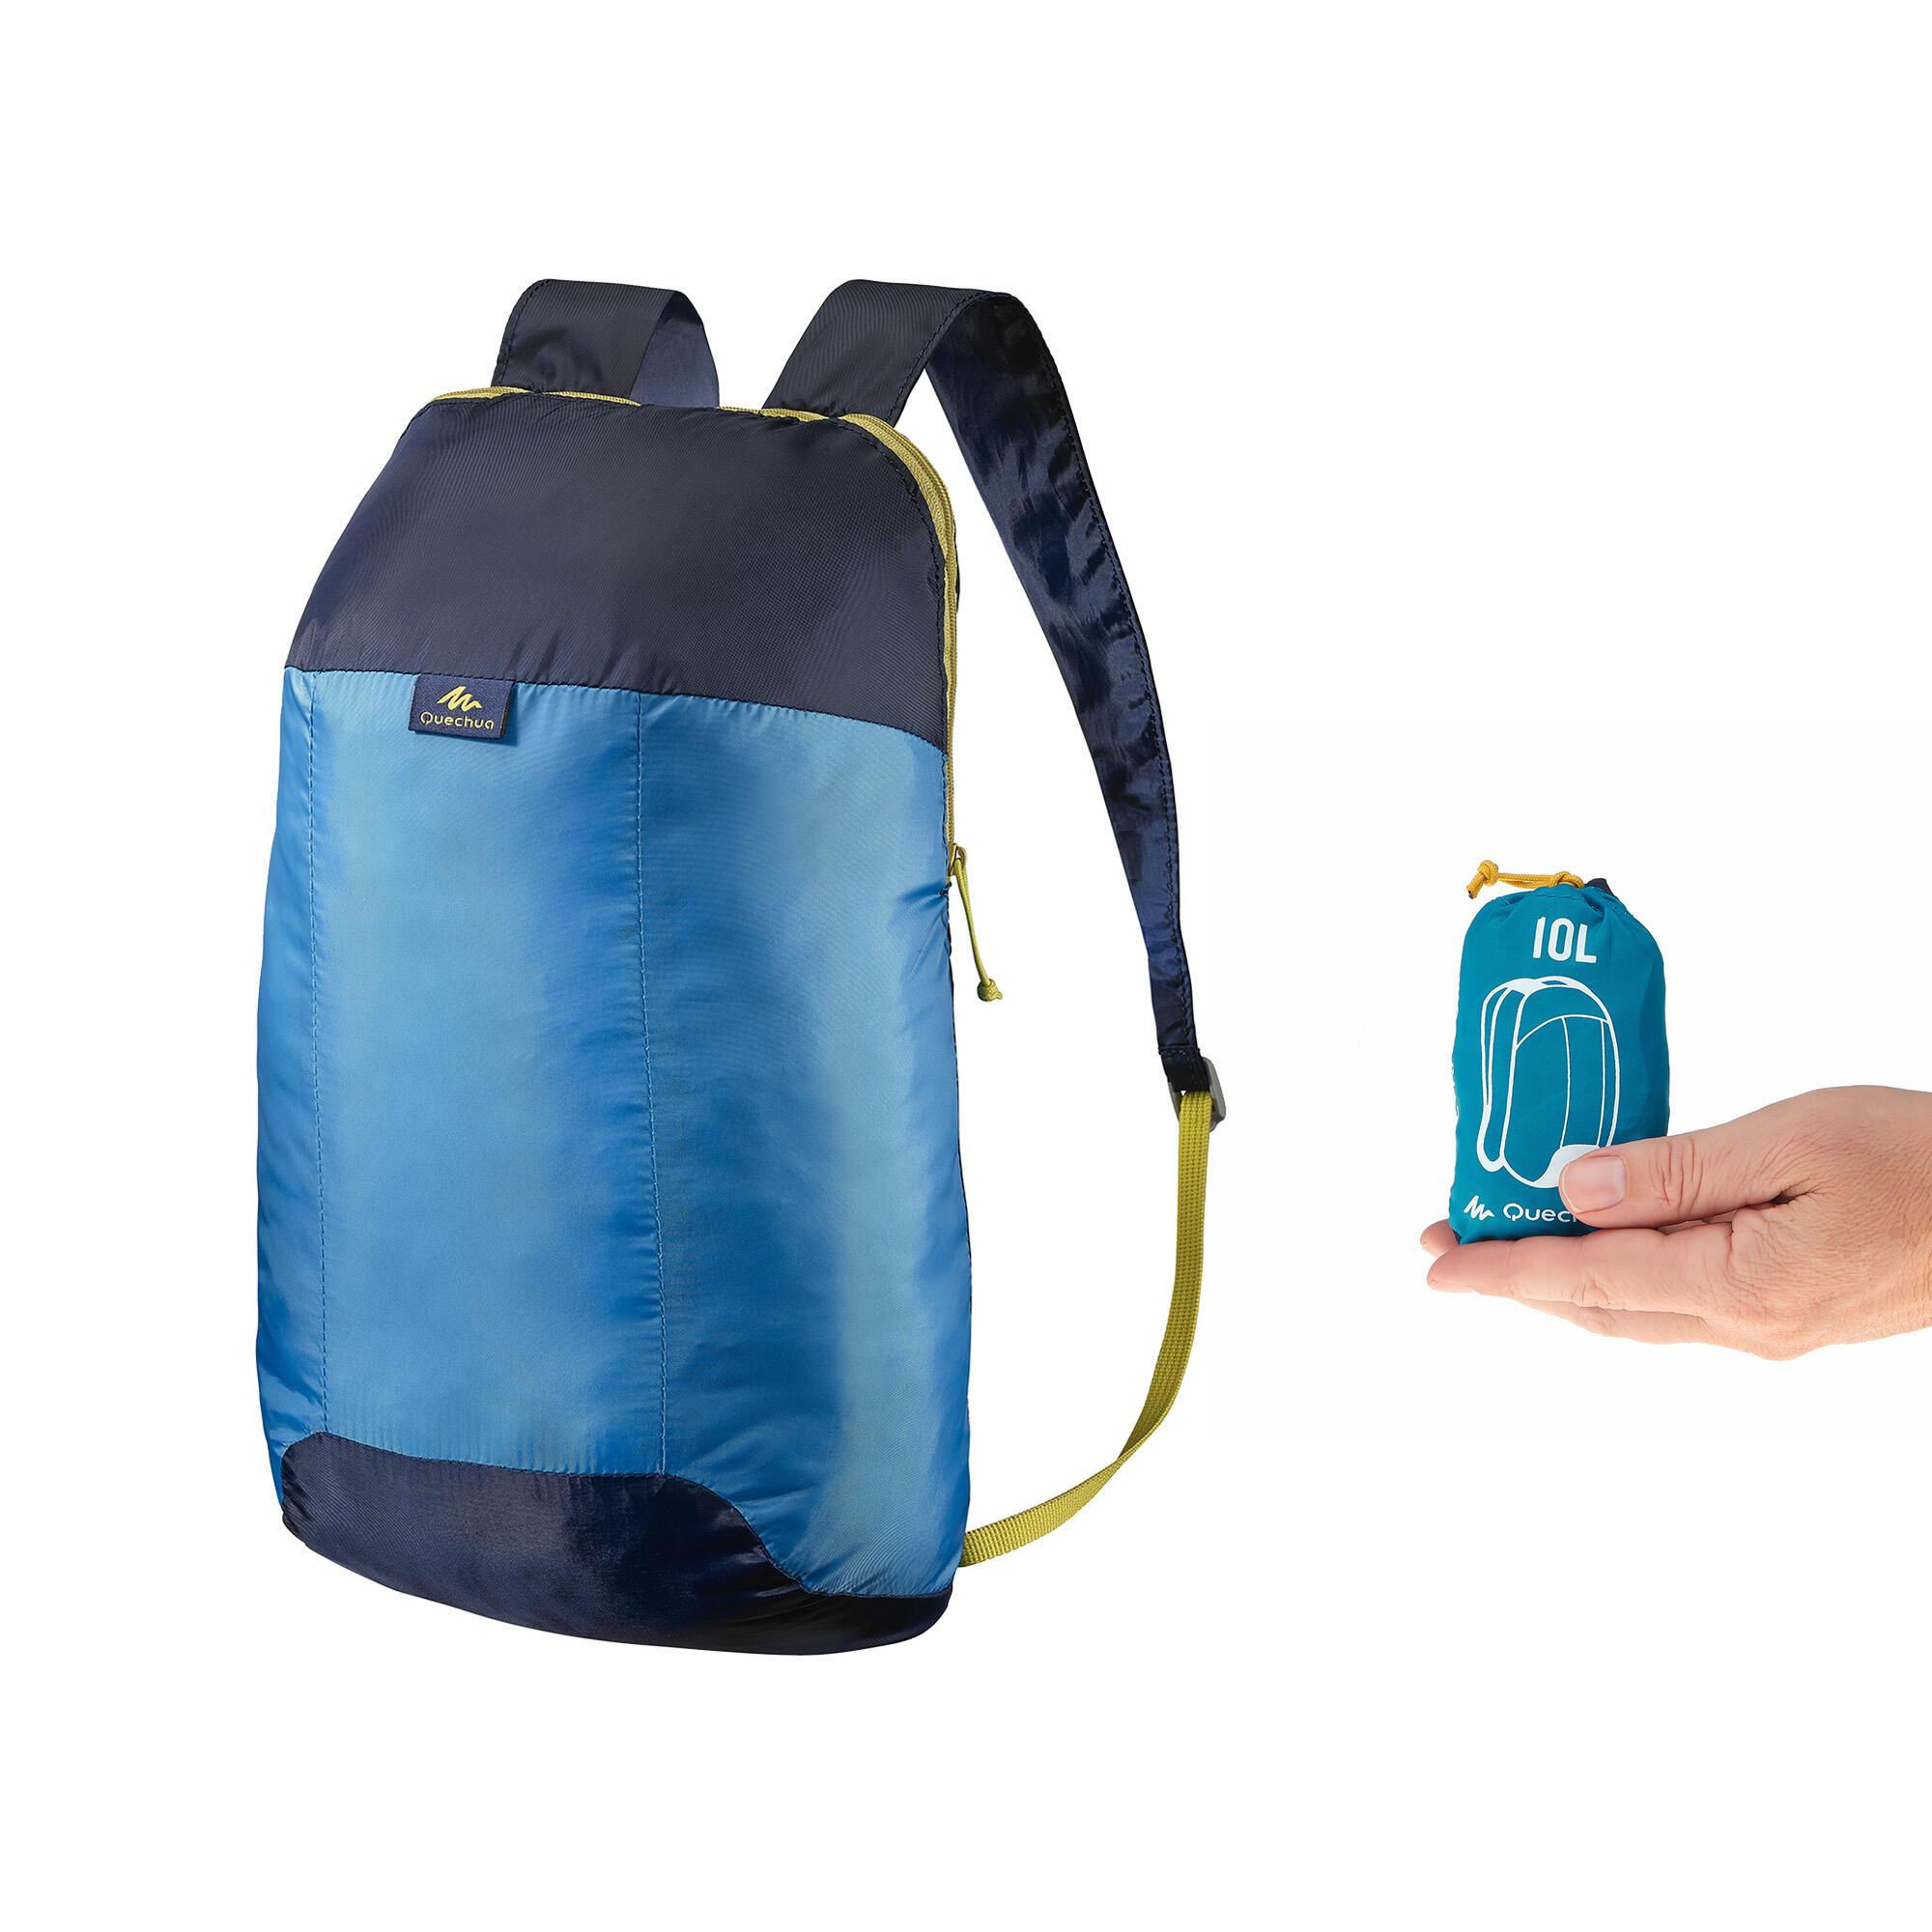 aac63bd9b77 Backpacks en accessoires - Sneaker Top Shop